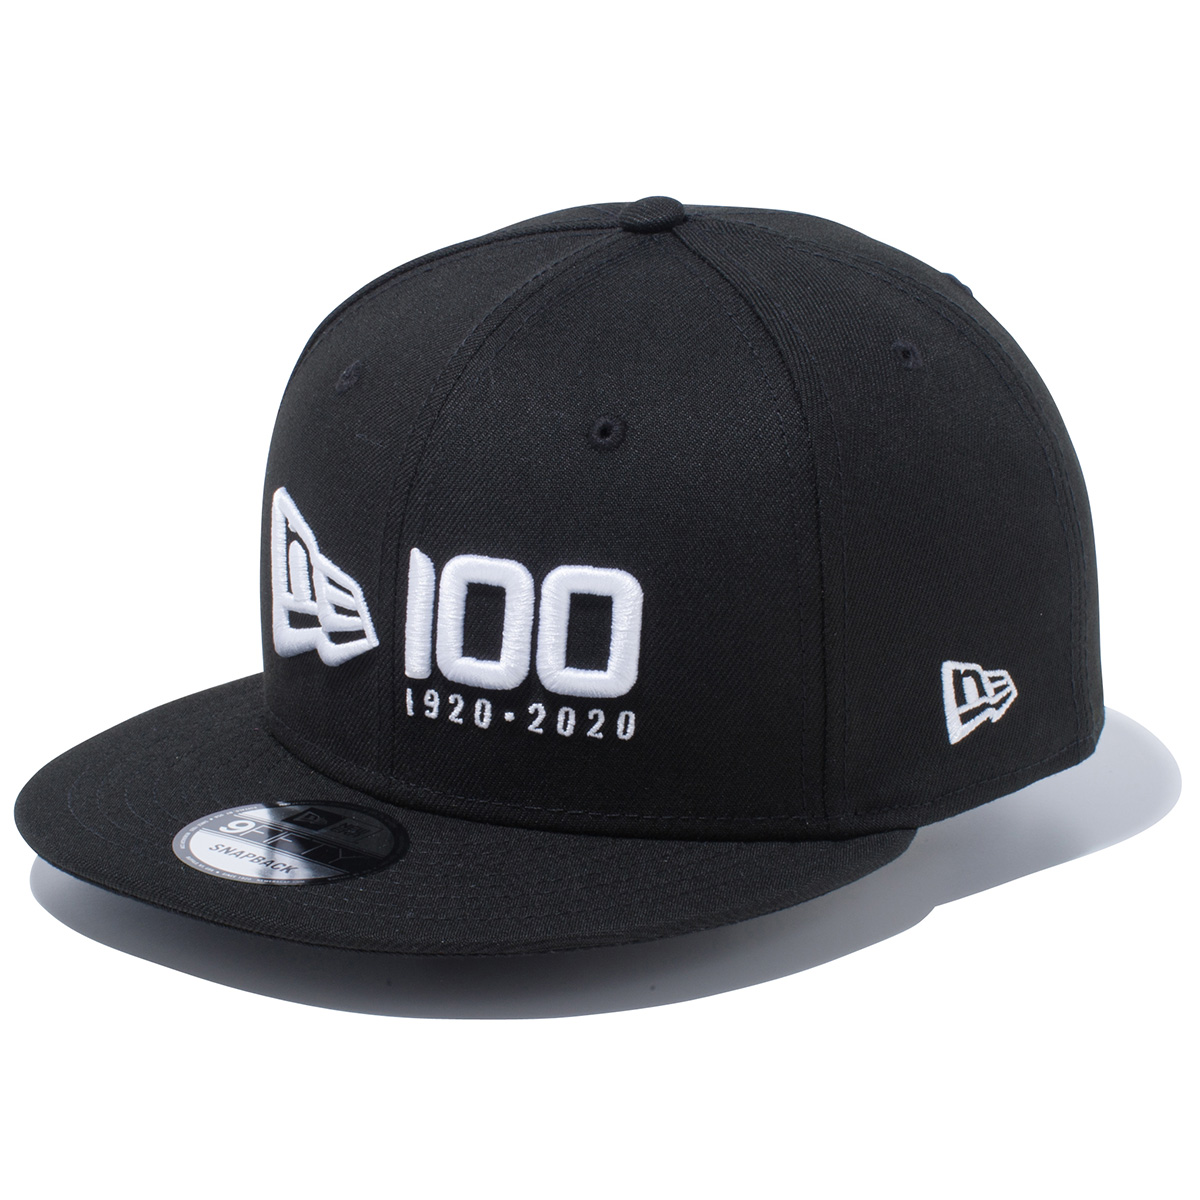 950 NEW ERA 100TH LOGO キャップ